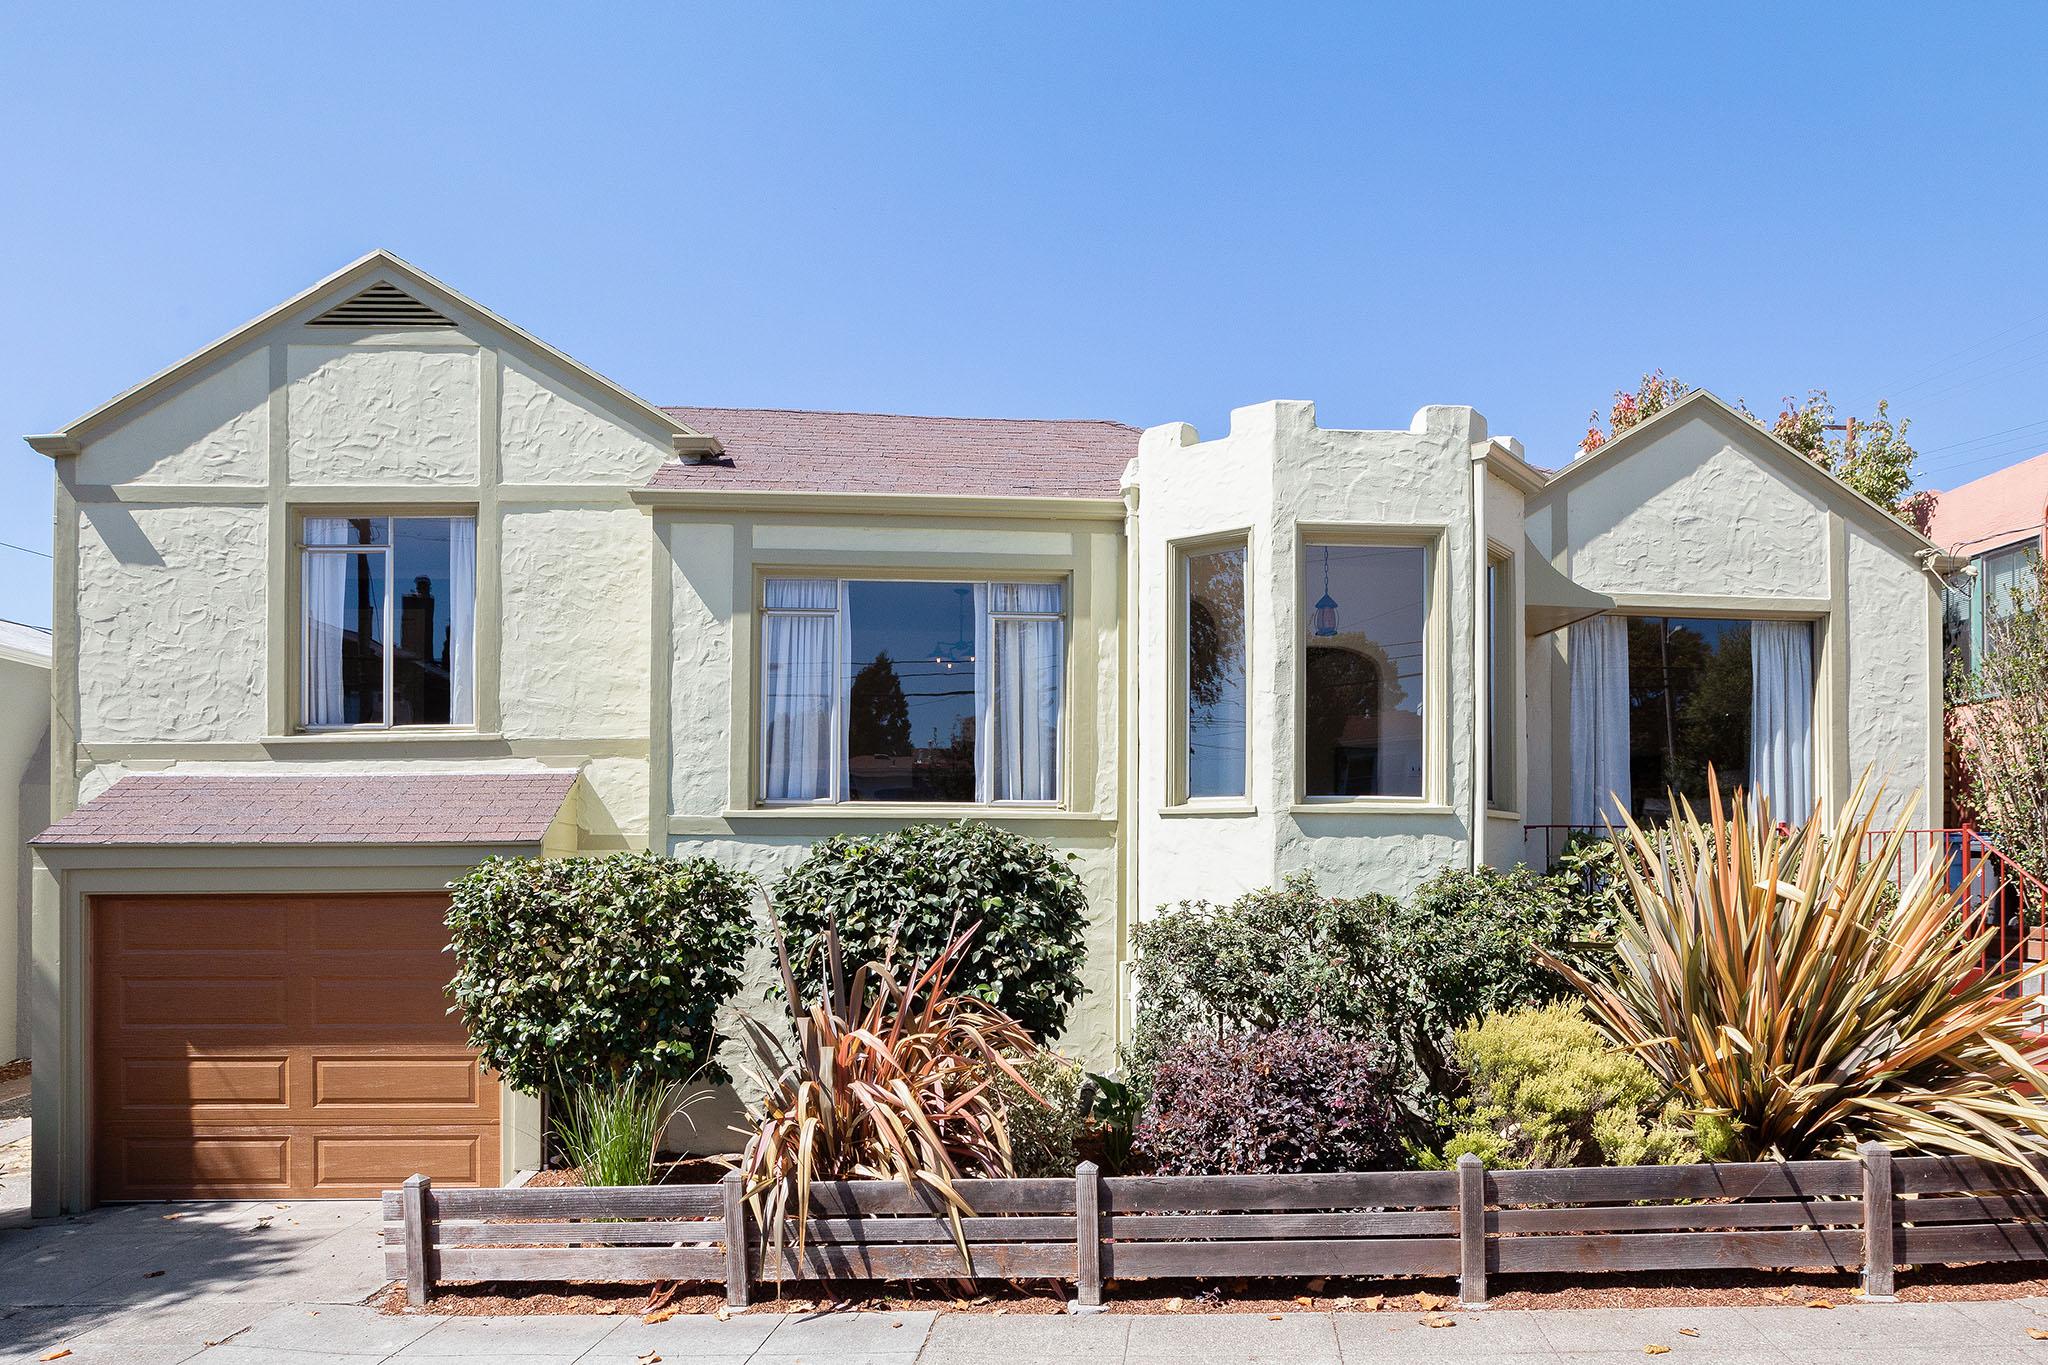 1186 Monterey Ave, Berkeley, CA 94707